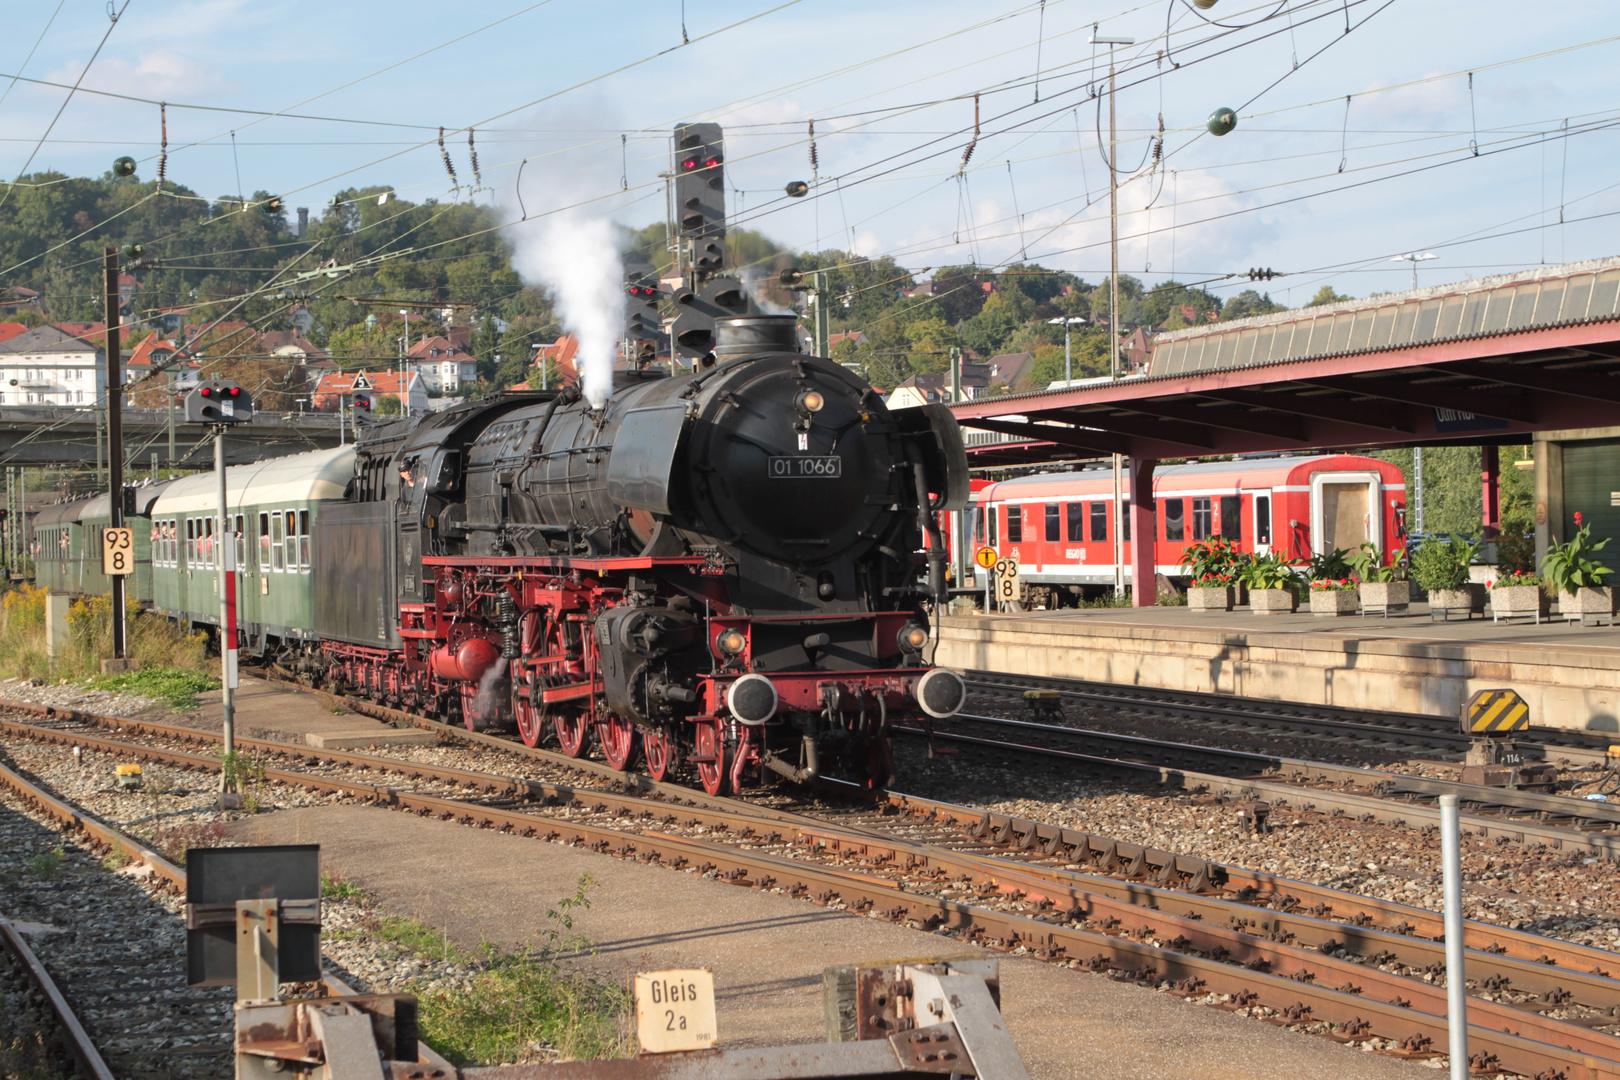 Dampflok 01 1066